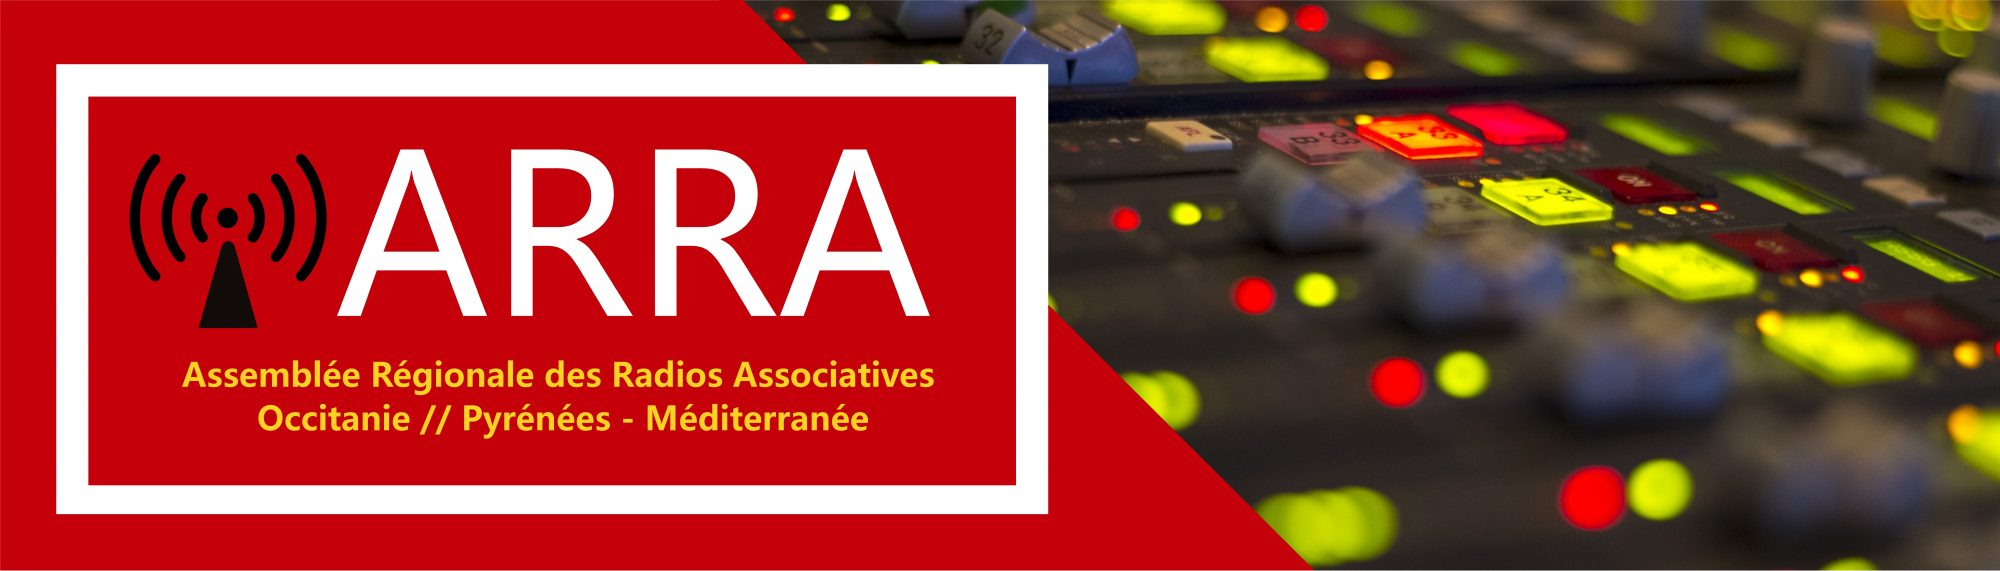 Les radios associatives de l'ARRA au cœur des festivals